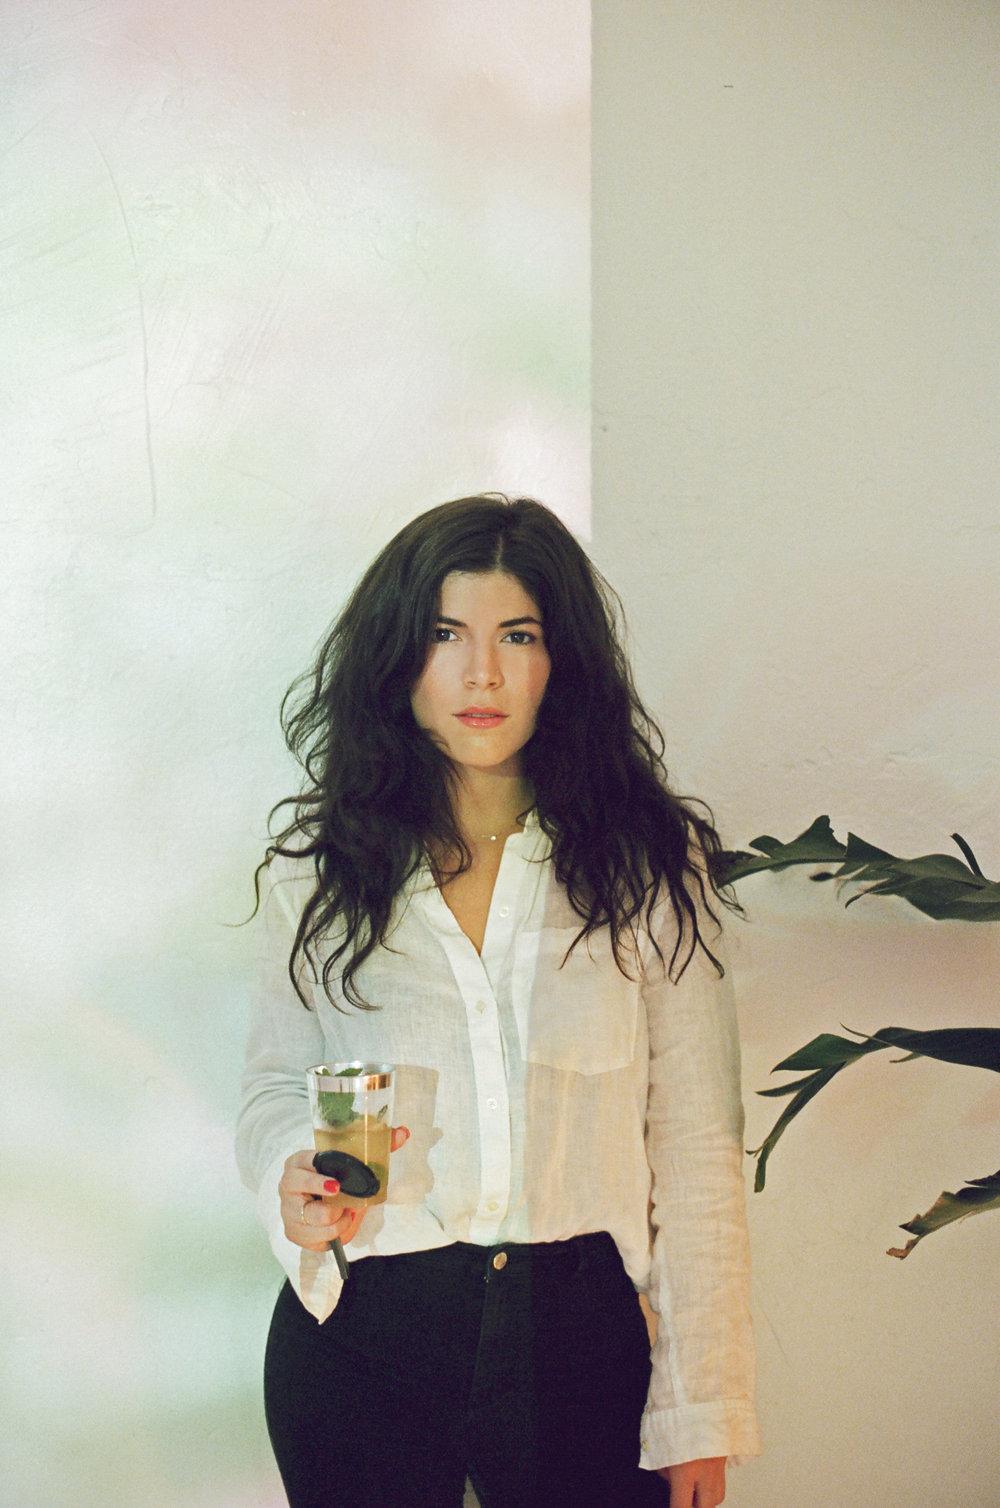 Sara-Cristina-Christina-Arza-NoHo-NYC-event-2.jpg